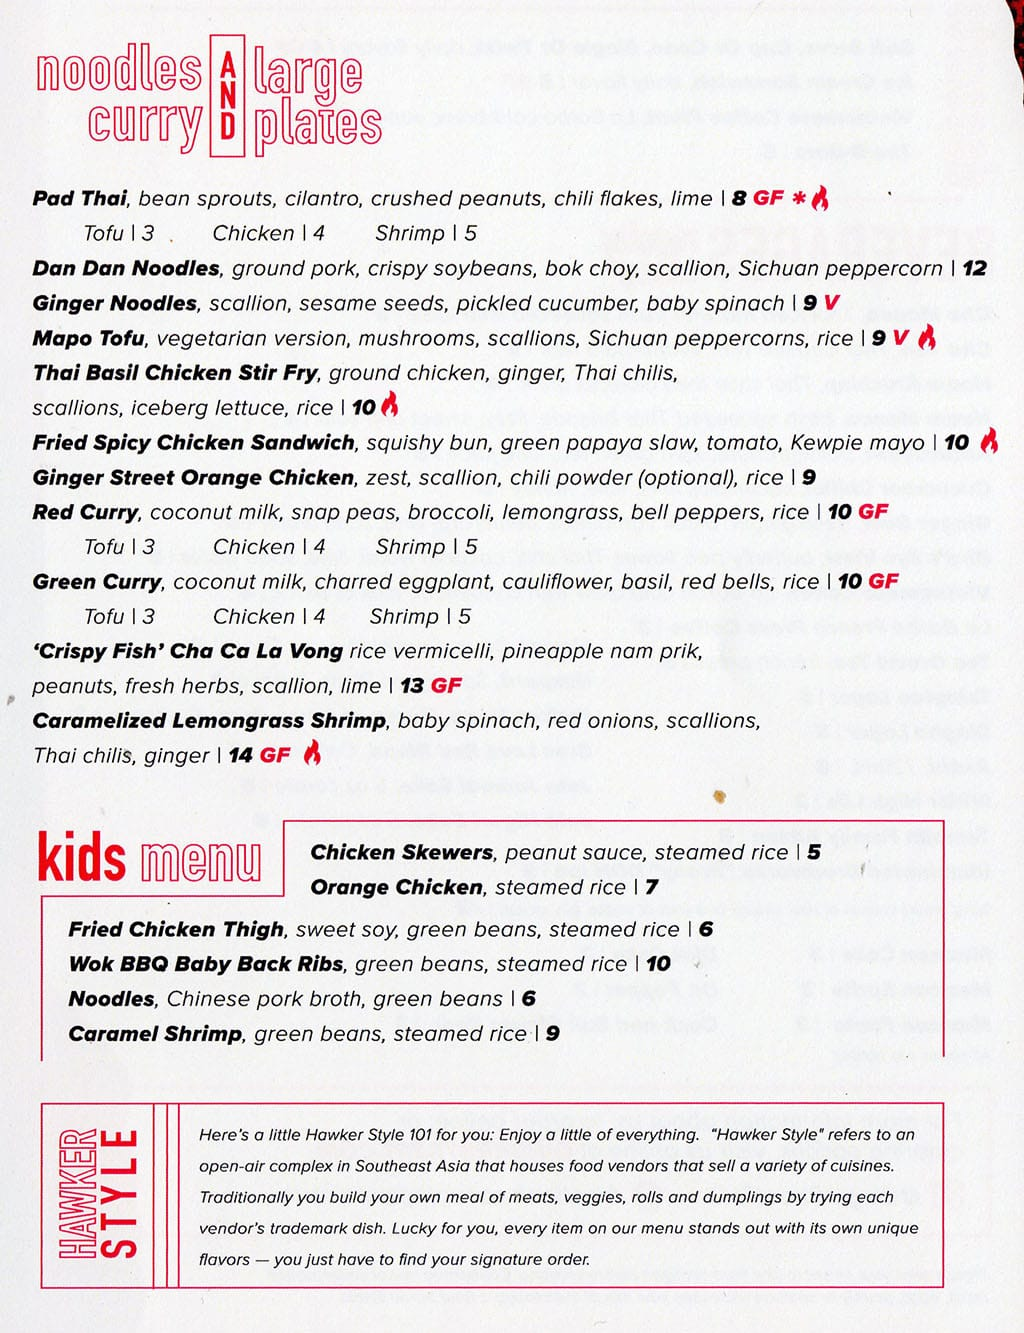 Ginger Street menu - noodles, curry, large plates, kids